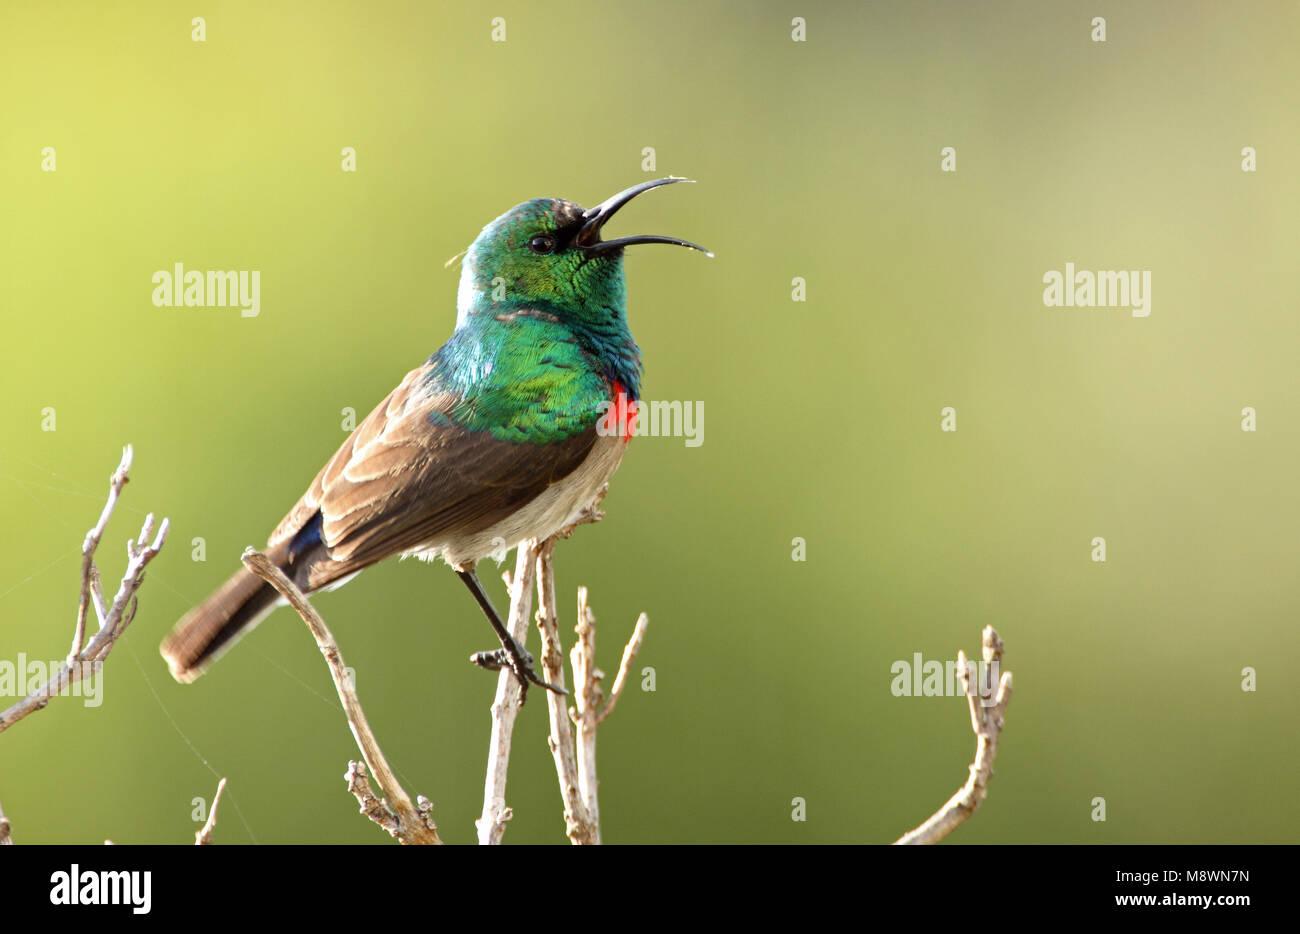 Zingende Kleine Kraaghoningzuiger, Southern Double-collared Sunbird singing - Stock Image